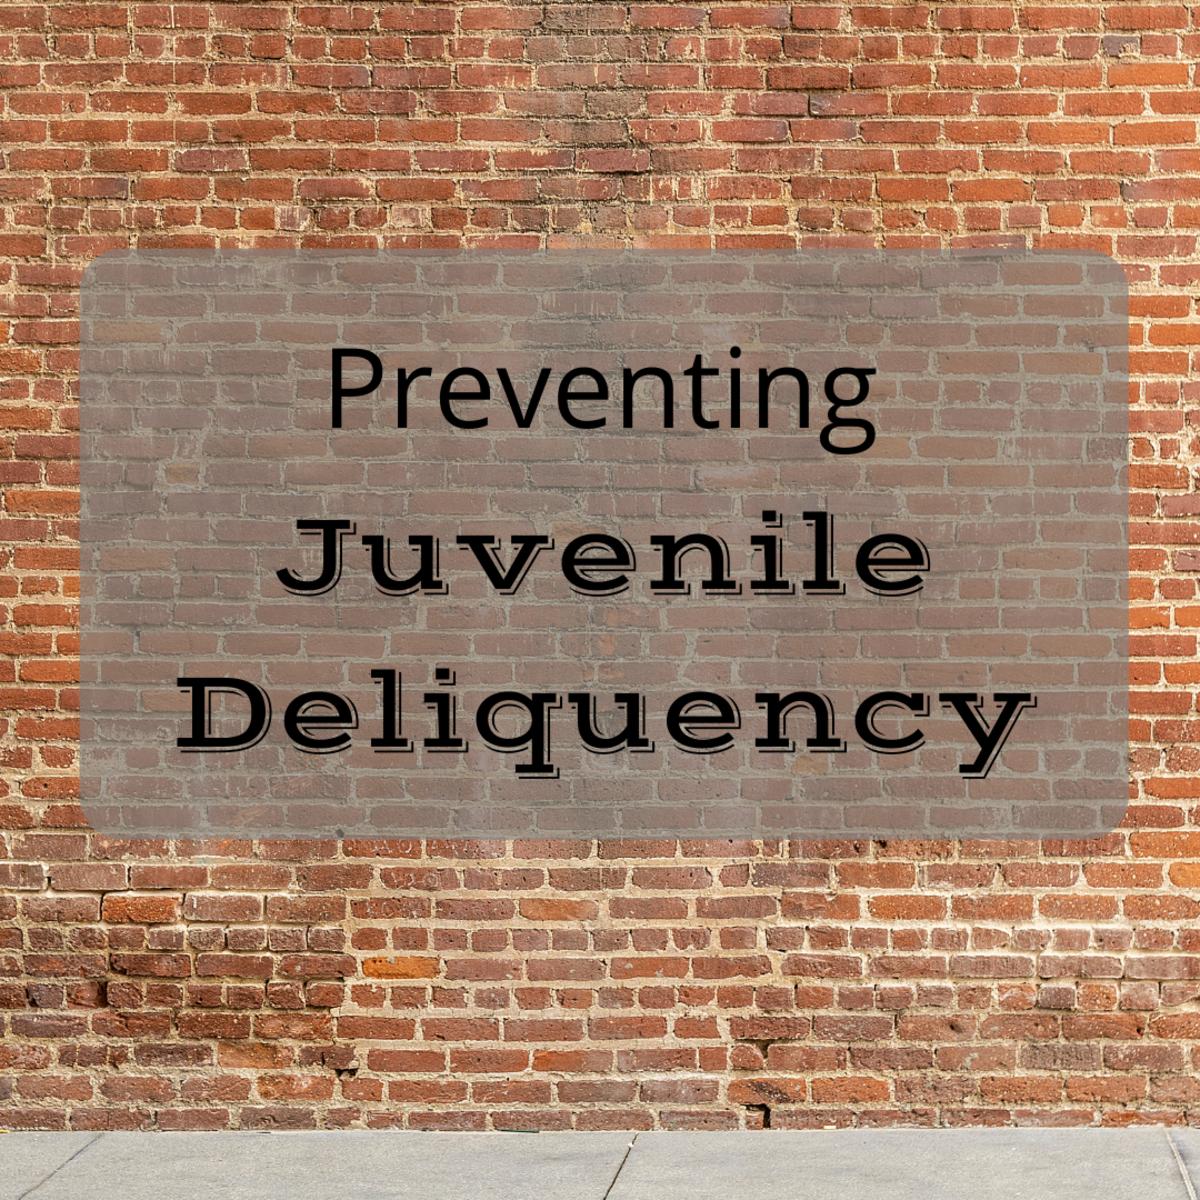 Preventing Juvenile Delinquency